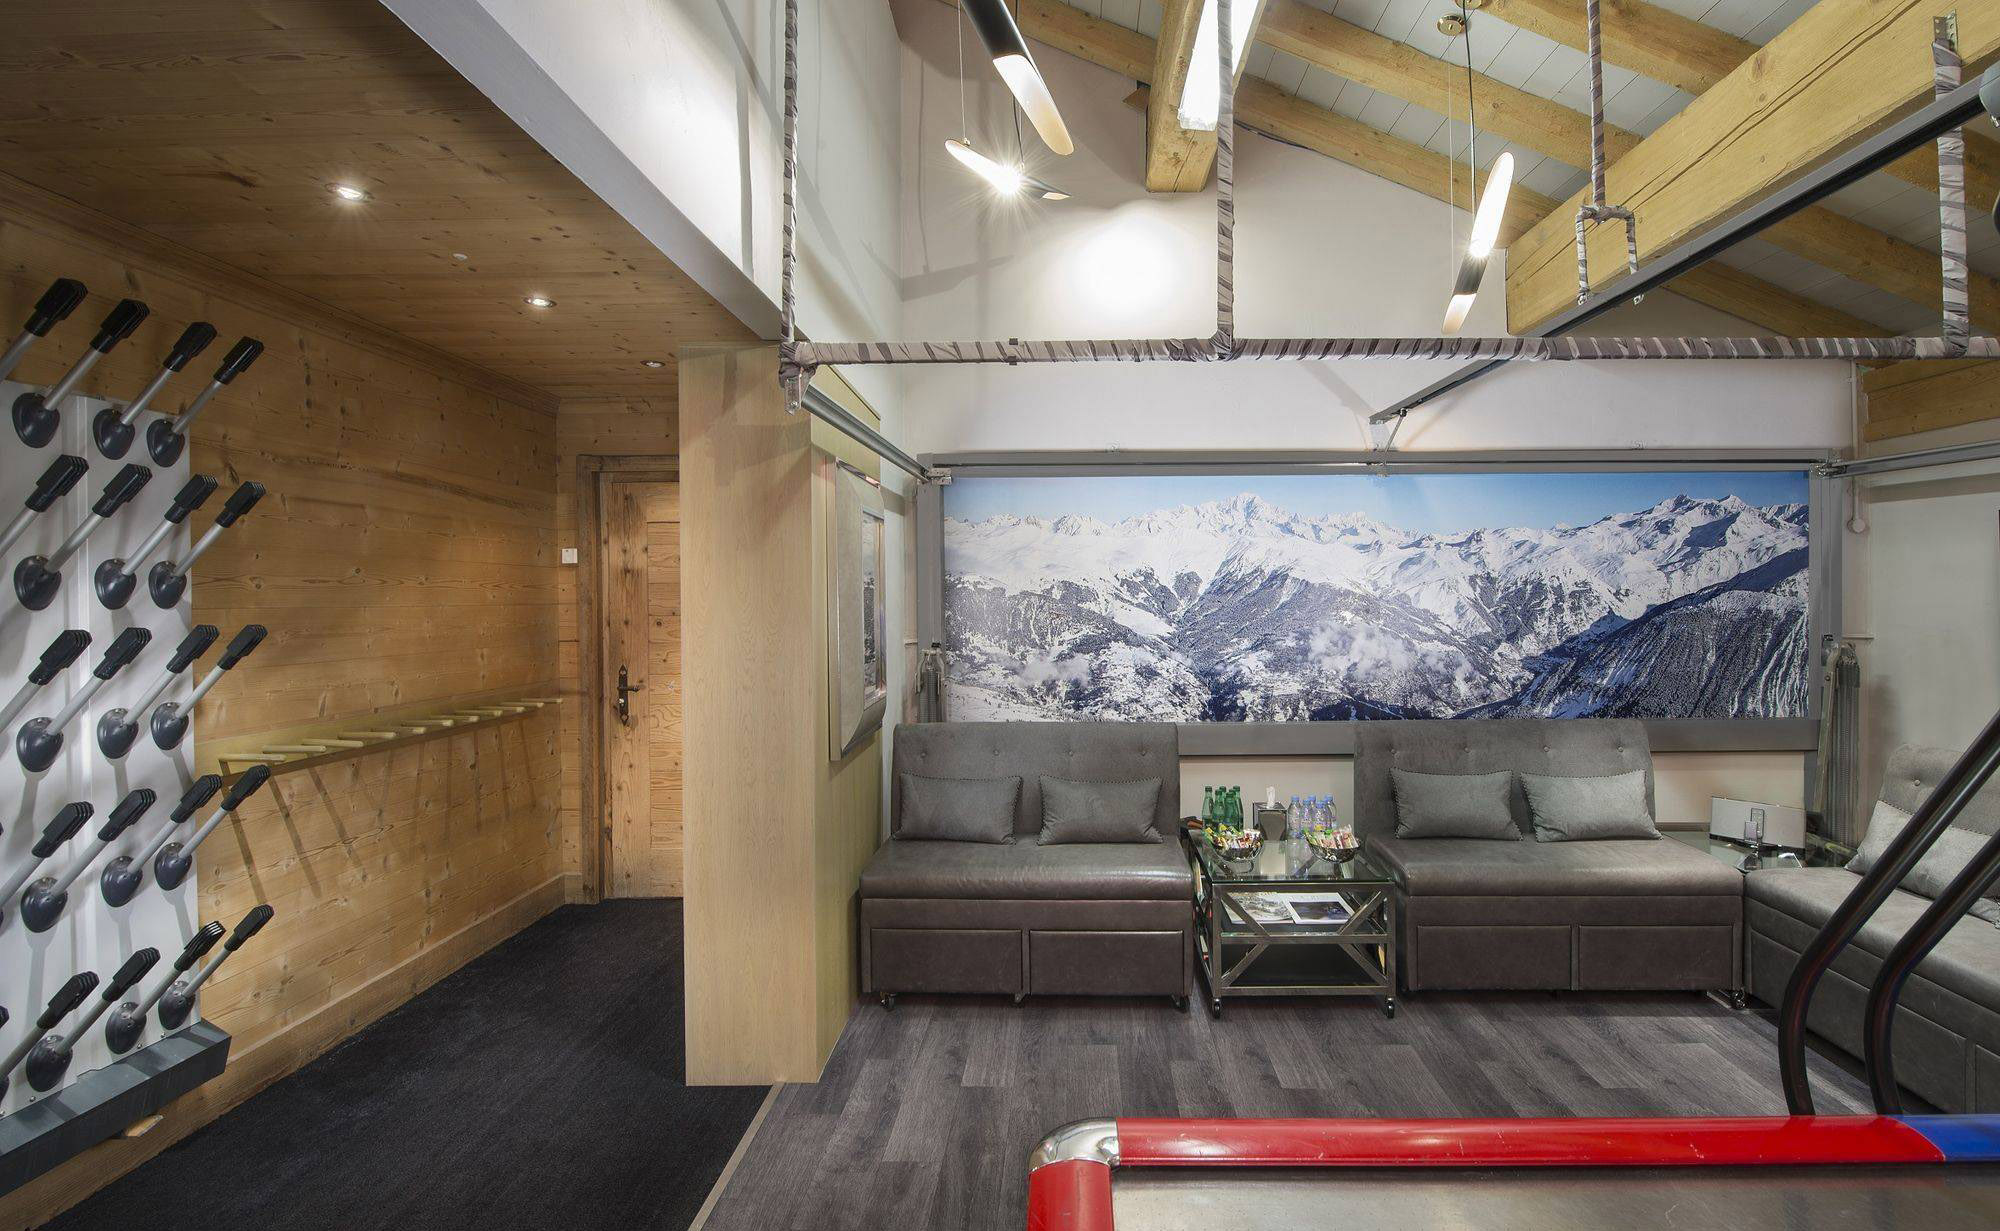 Lovelydays luxury service apartment rental - Courchevel - Great Roc Chalet - Partner - 7 bedrooms - 6 bathrooms - Comfortable sofa - d3aff5658a0b - Lovelydays